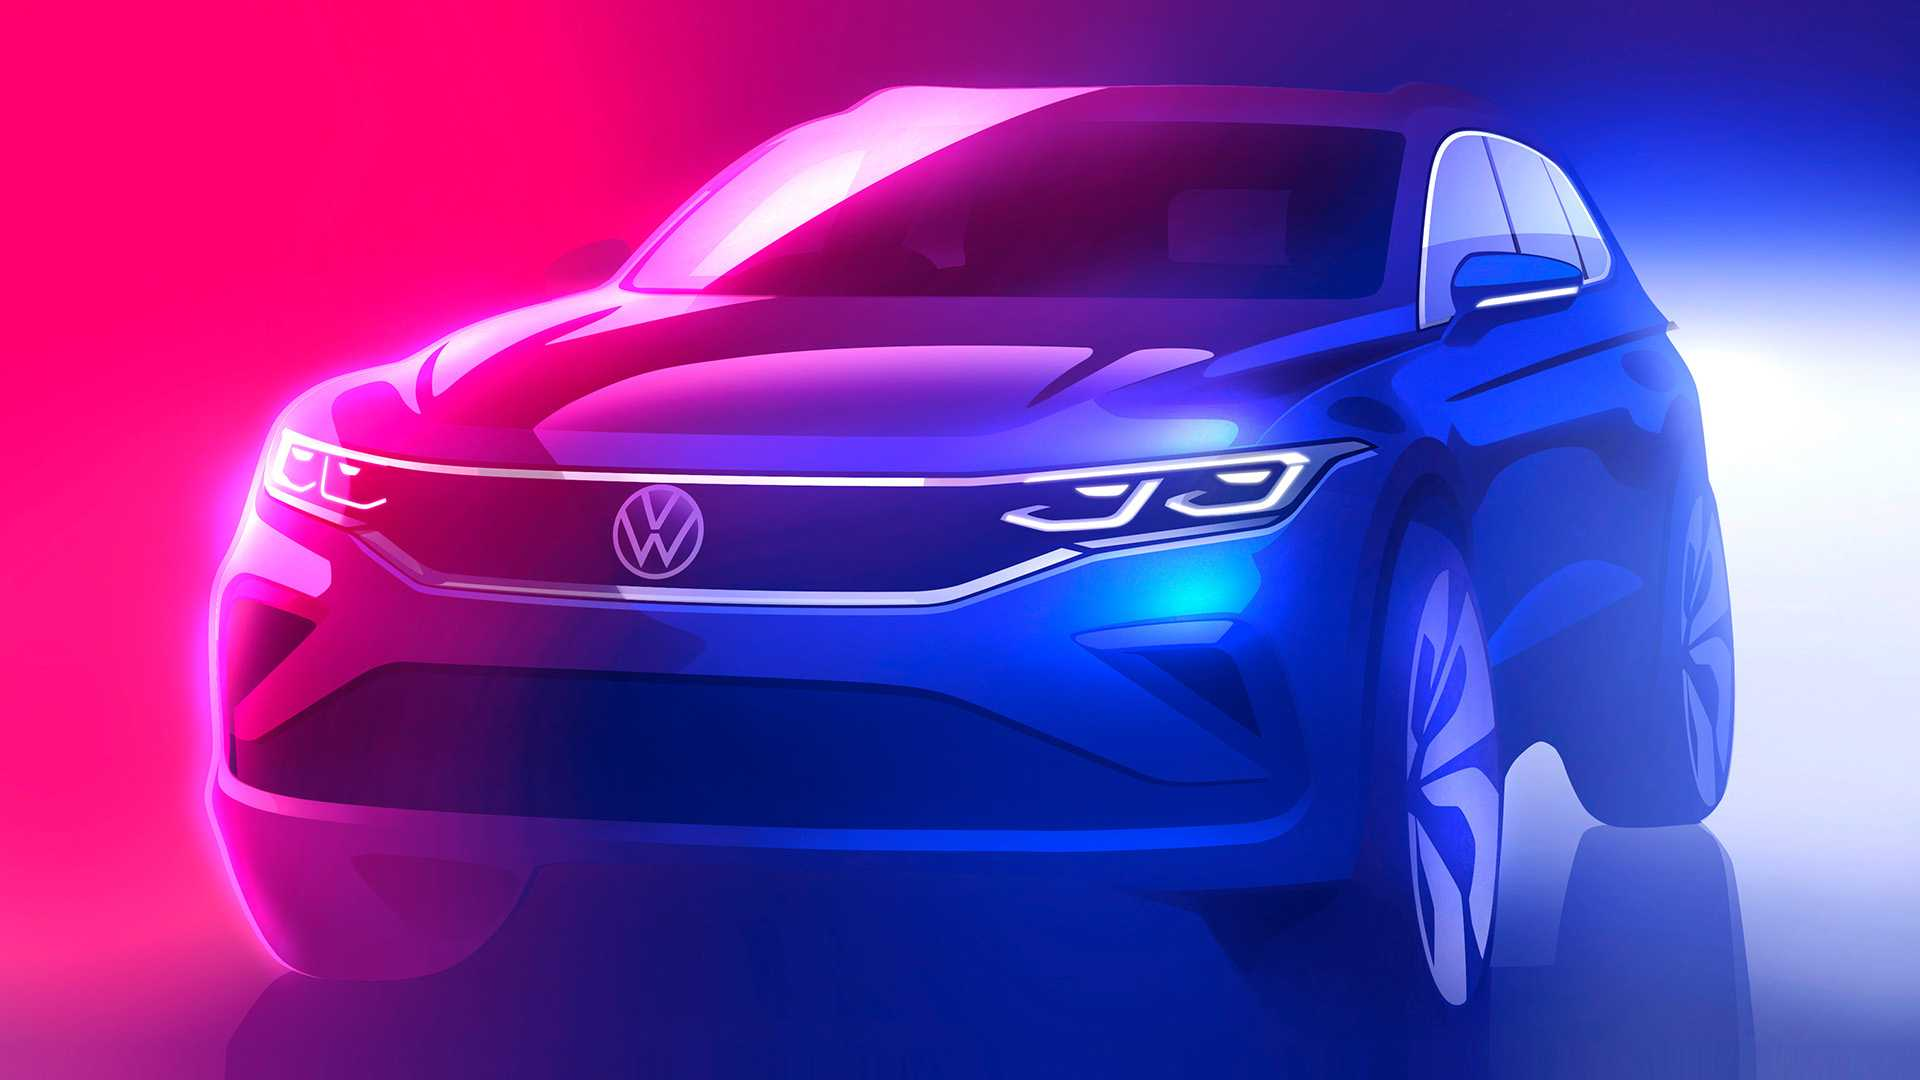 2021 Volkswagen Tiguan Mid Cycle Facelift Teased